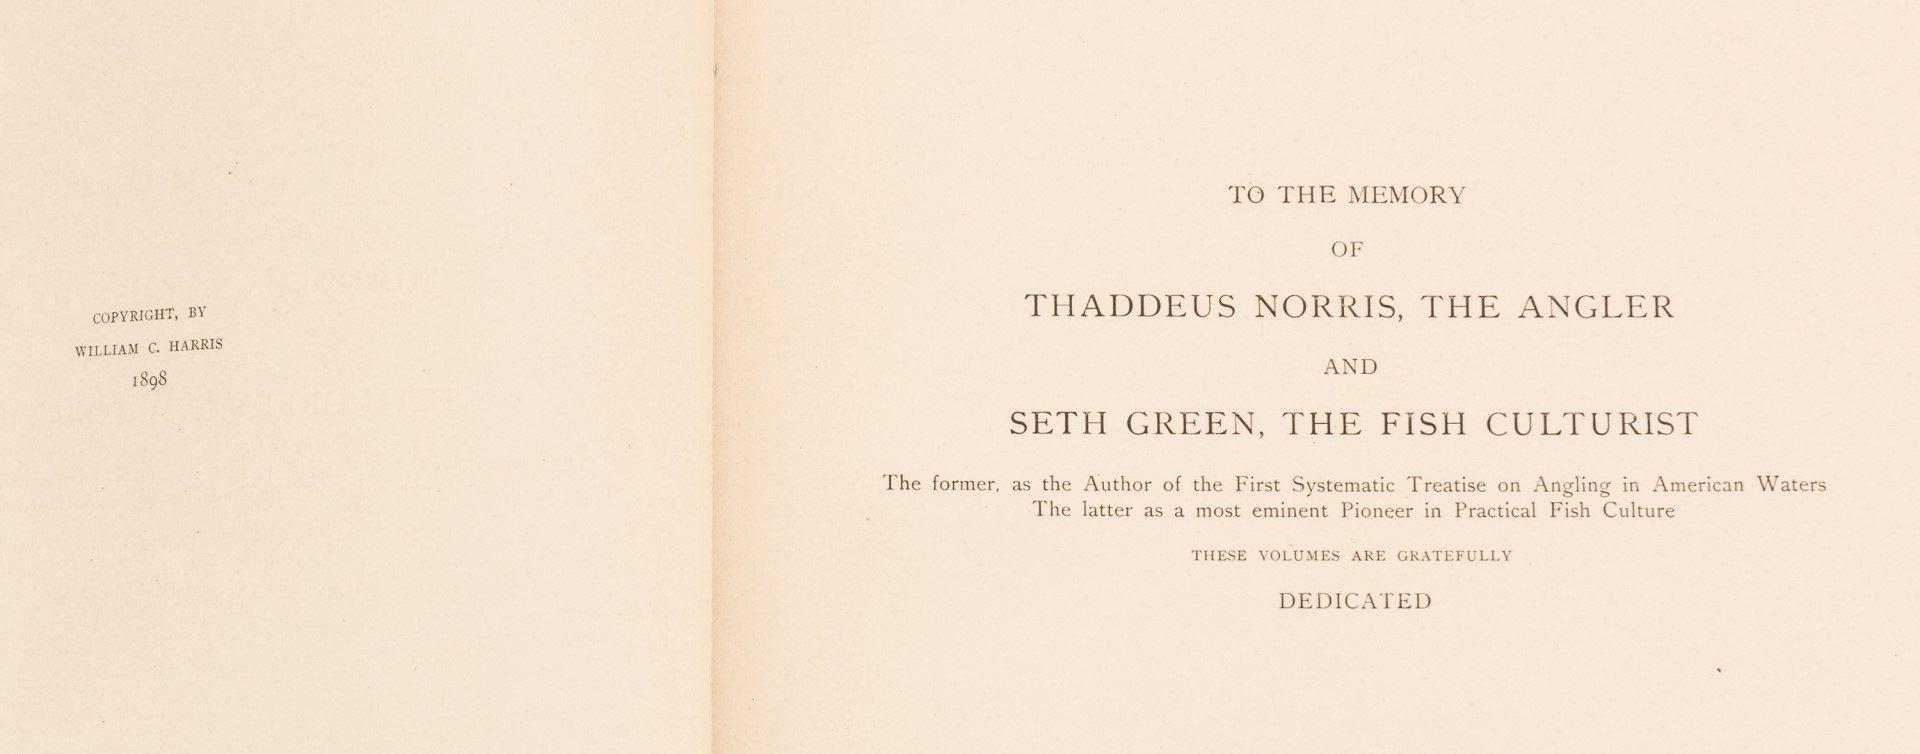 Lot 556: The Fishes of North America, William C. Harris, 18